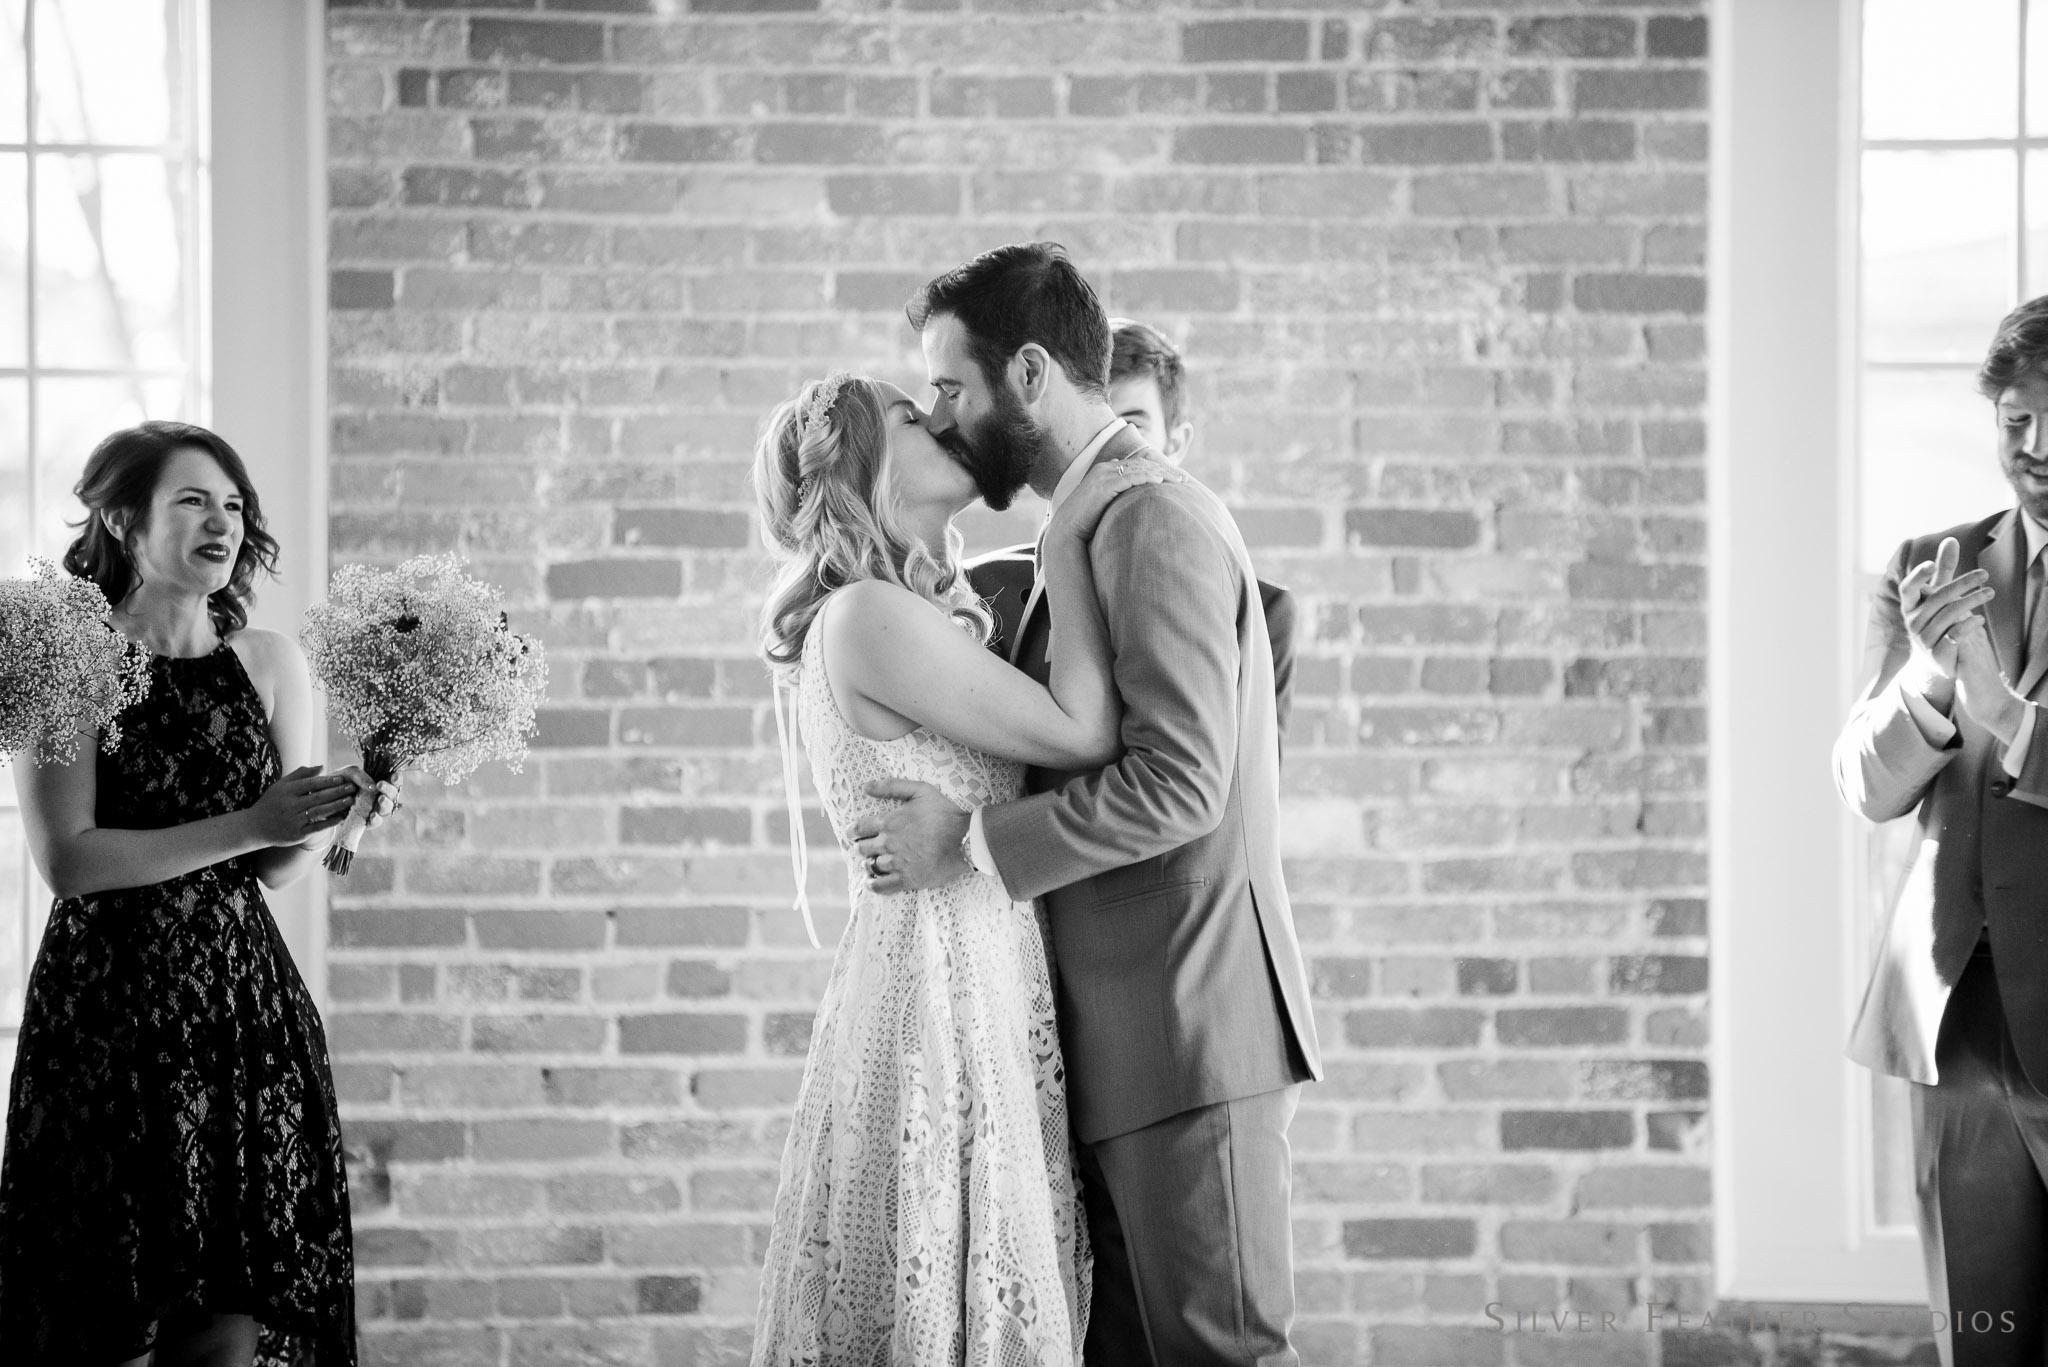 cotton-room-wedding-photography-038.jpg